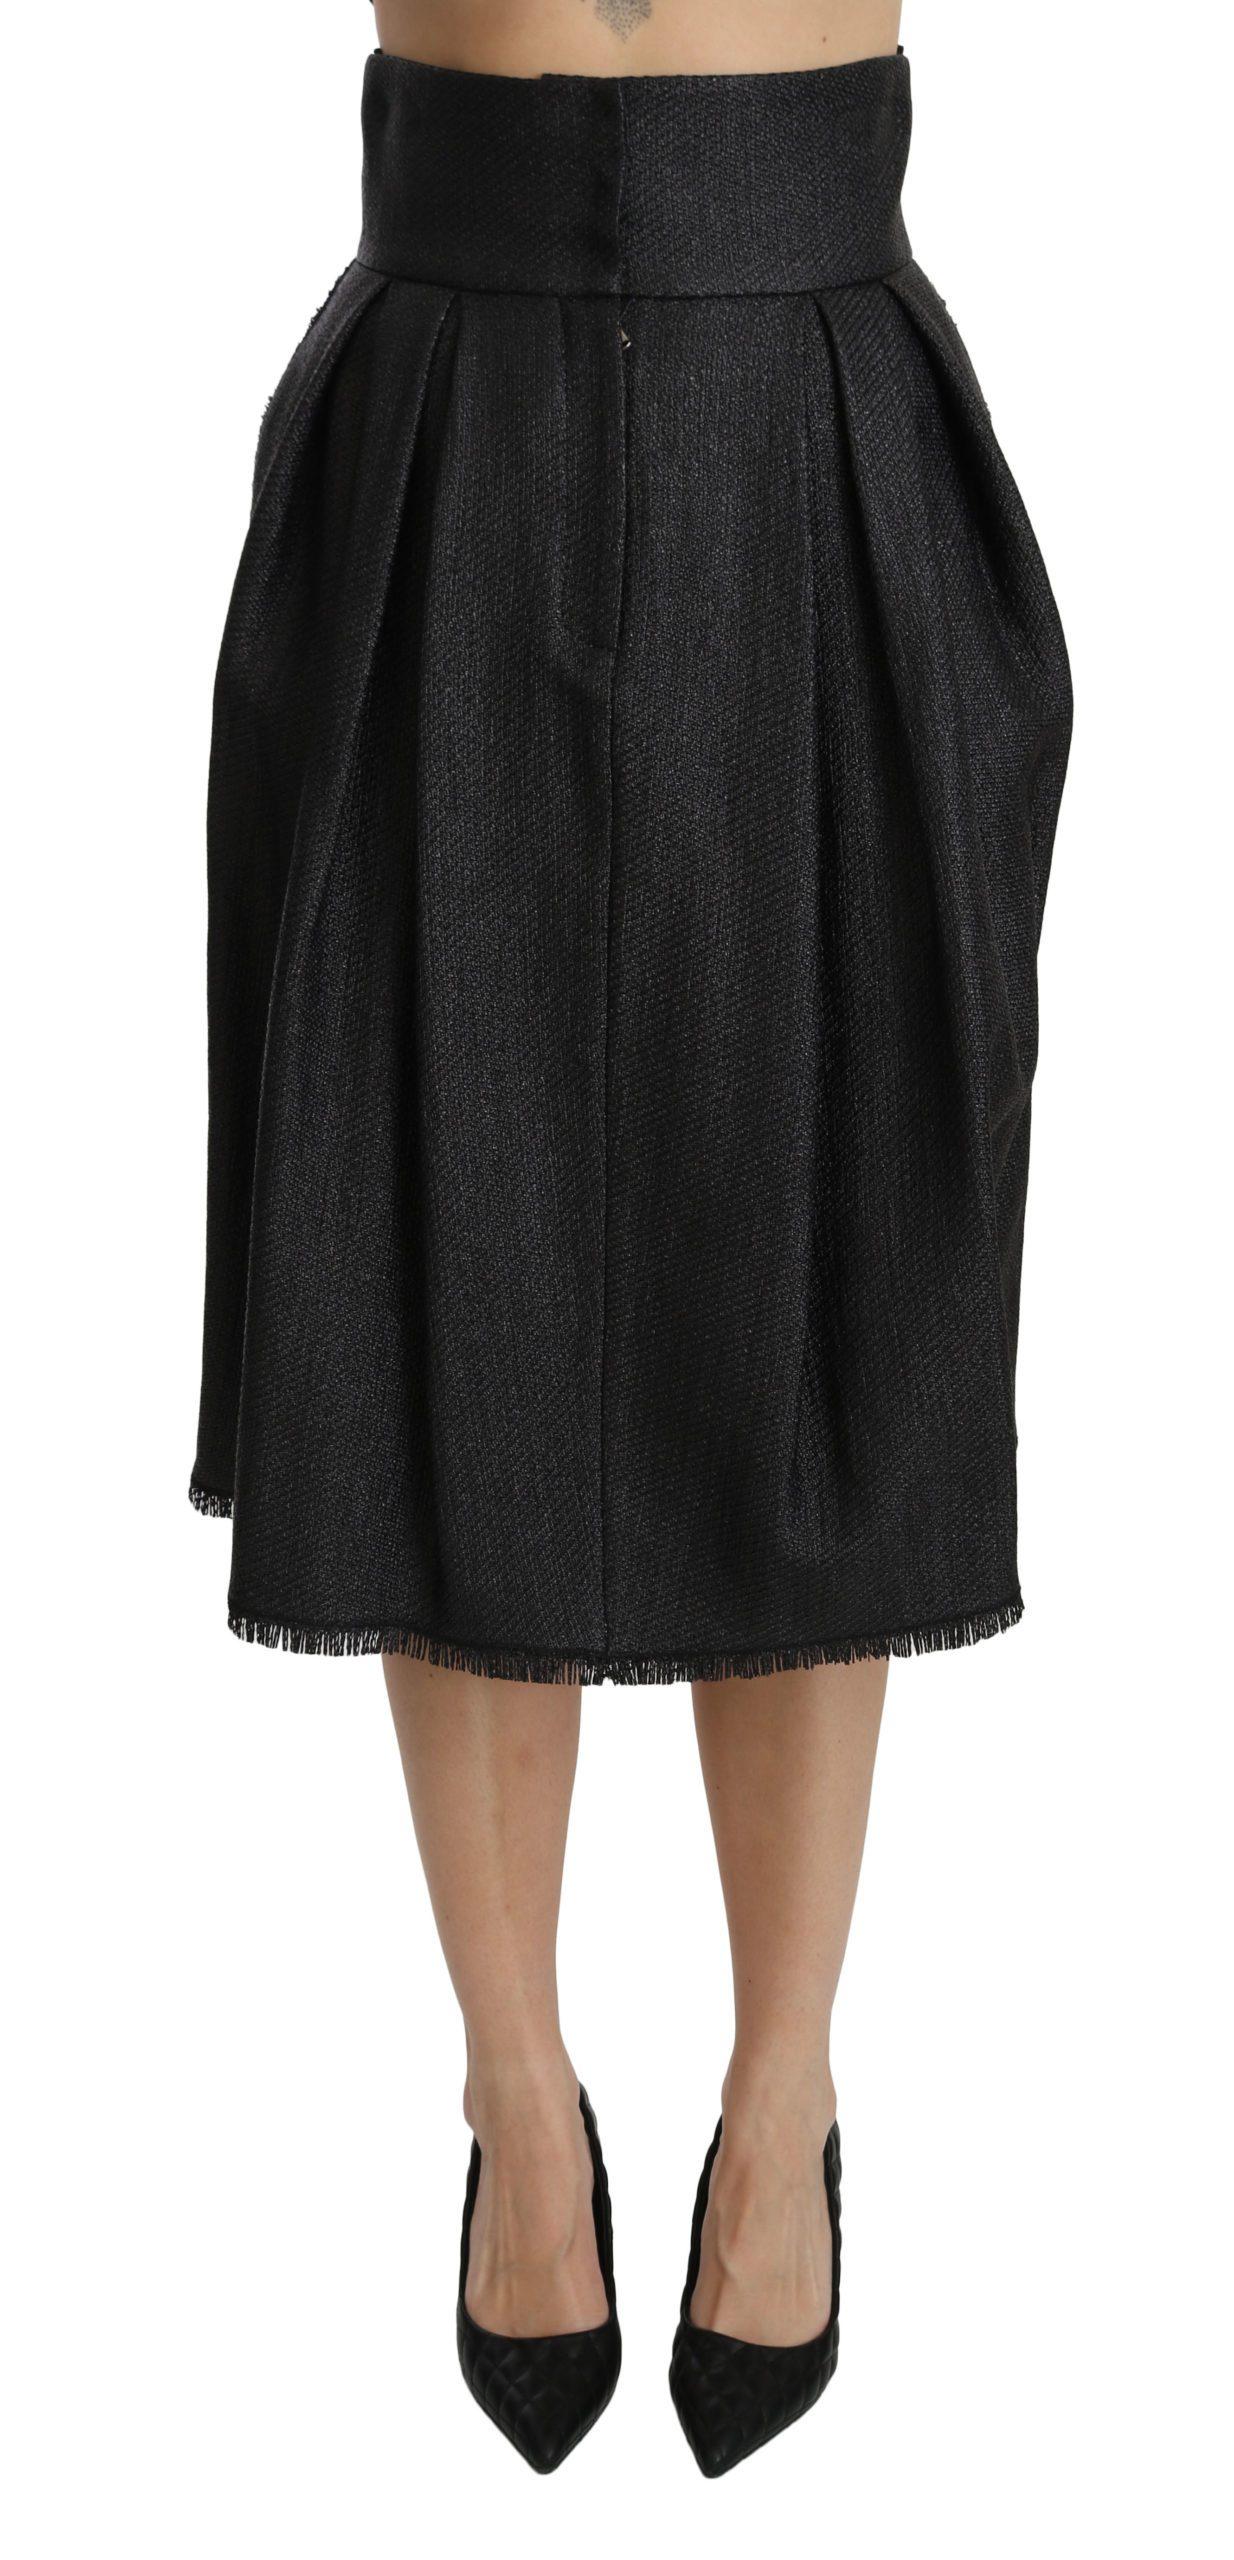 Dolce & Gabbana Women's Pleated High Waist Midi Skirt Black SKI1351 - IT40|S